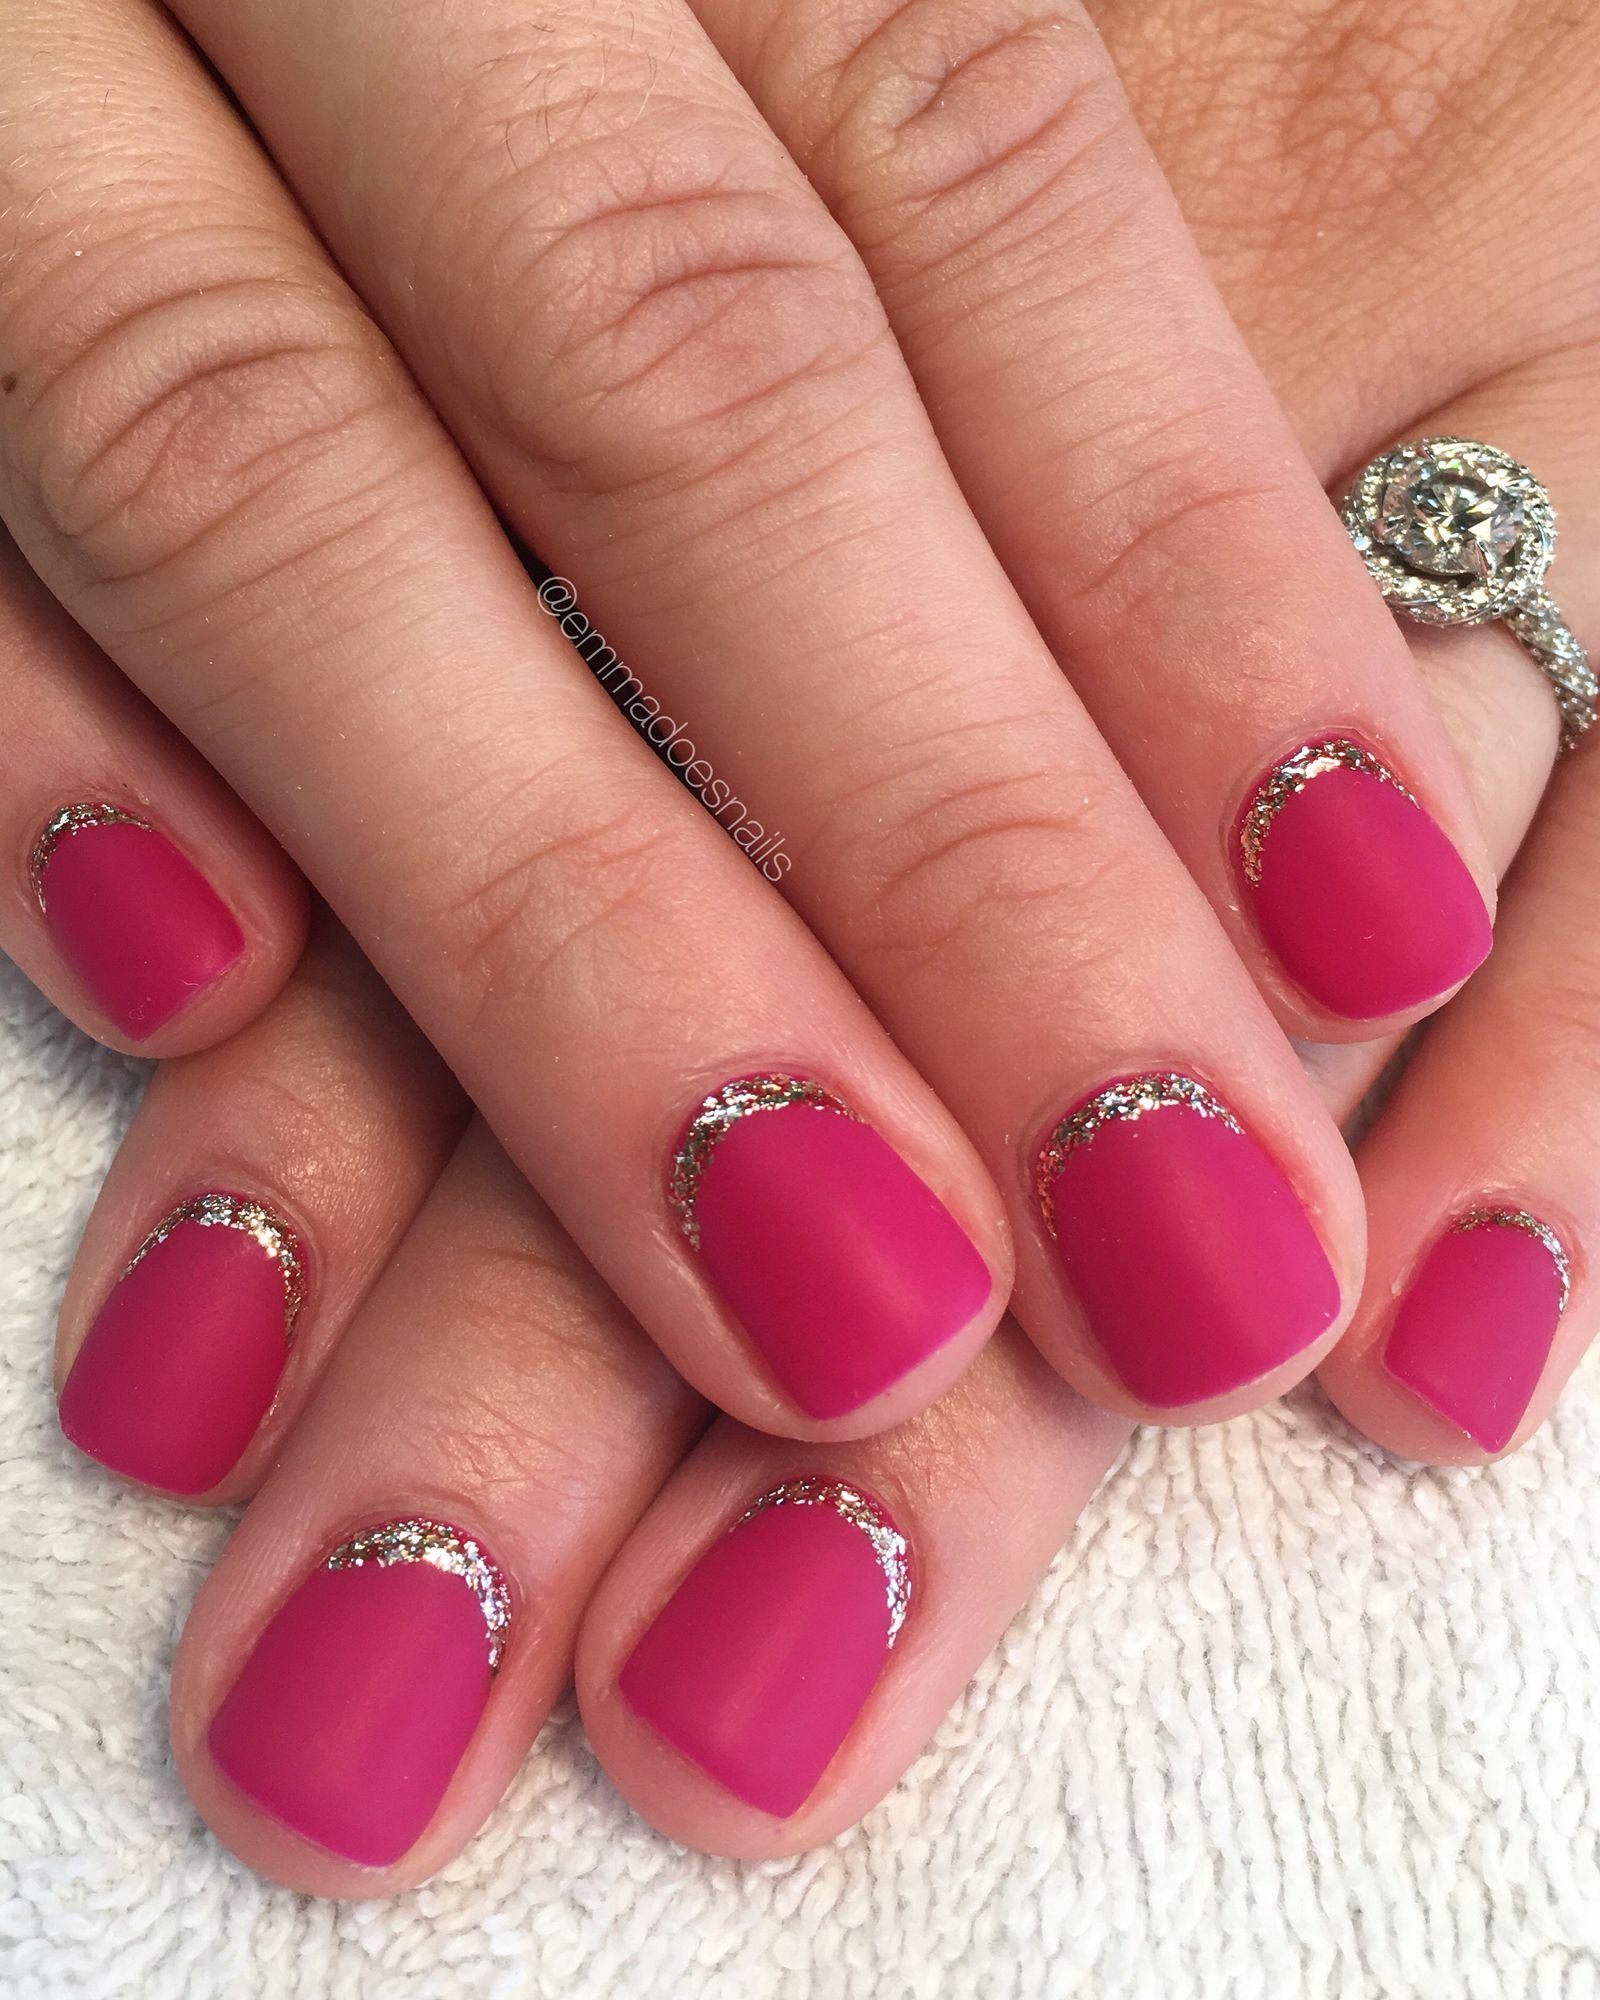 gel nails, gel mani, short nails, cute nails, emmadoesnails, Emma ...